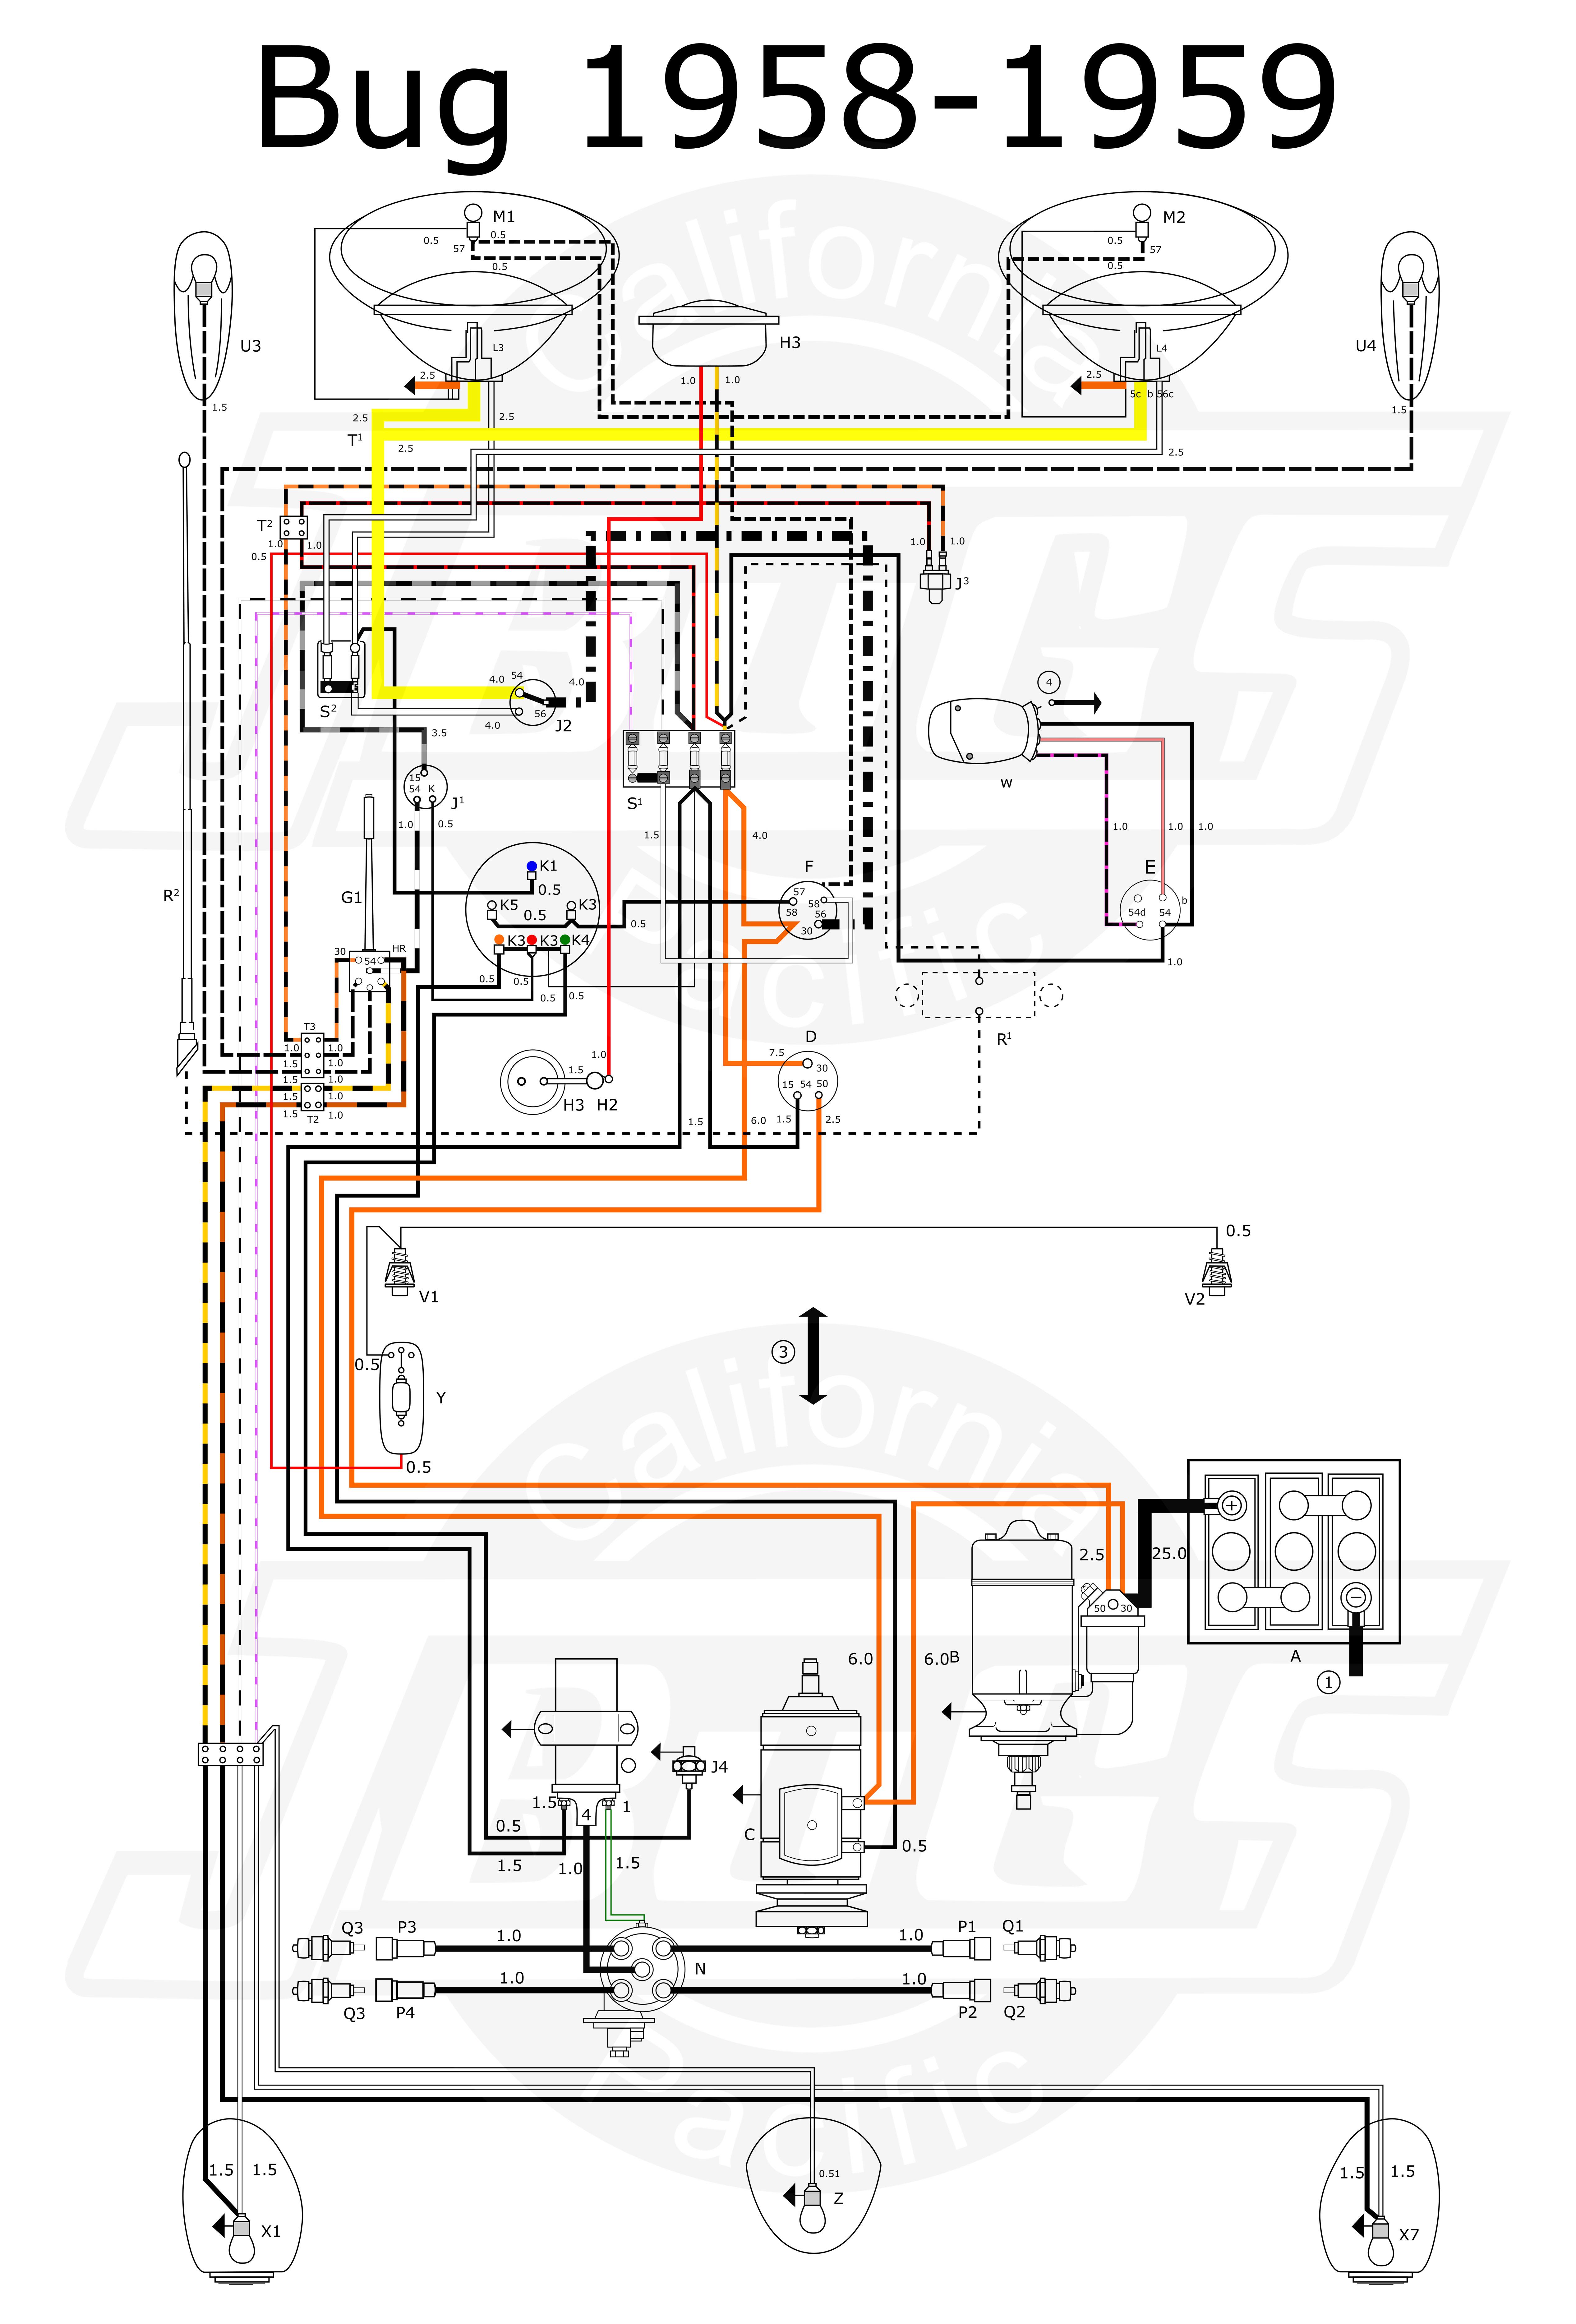 Vw Super Beetle Wiring Harness Trusted Diagram. 1974 Super Beetle Wiring Harness Worksheet And Diagram \u2022 Vw Coil. Volkswagen. 74 Vw Super Beetle Engine Wiring Diagram At Scoala.co